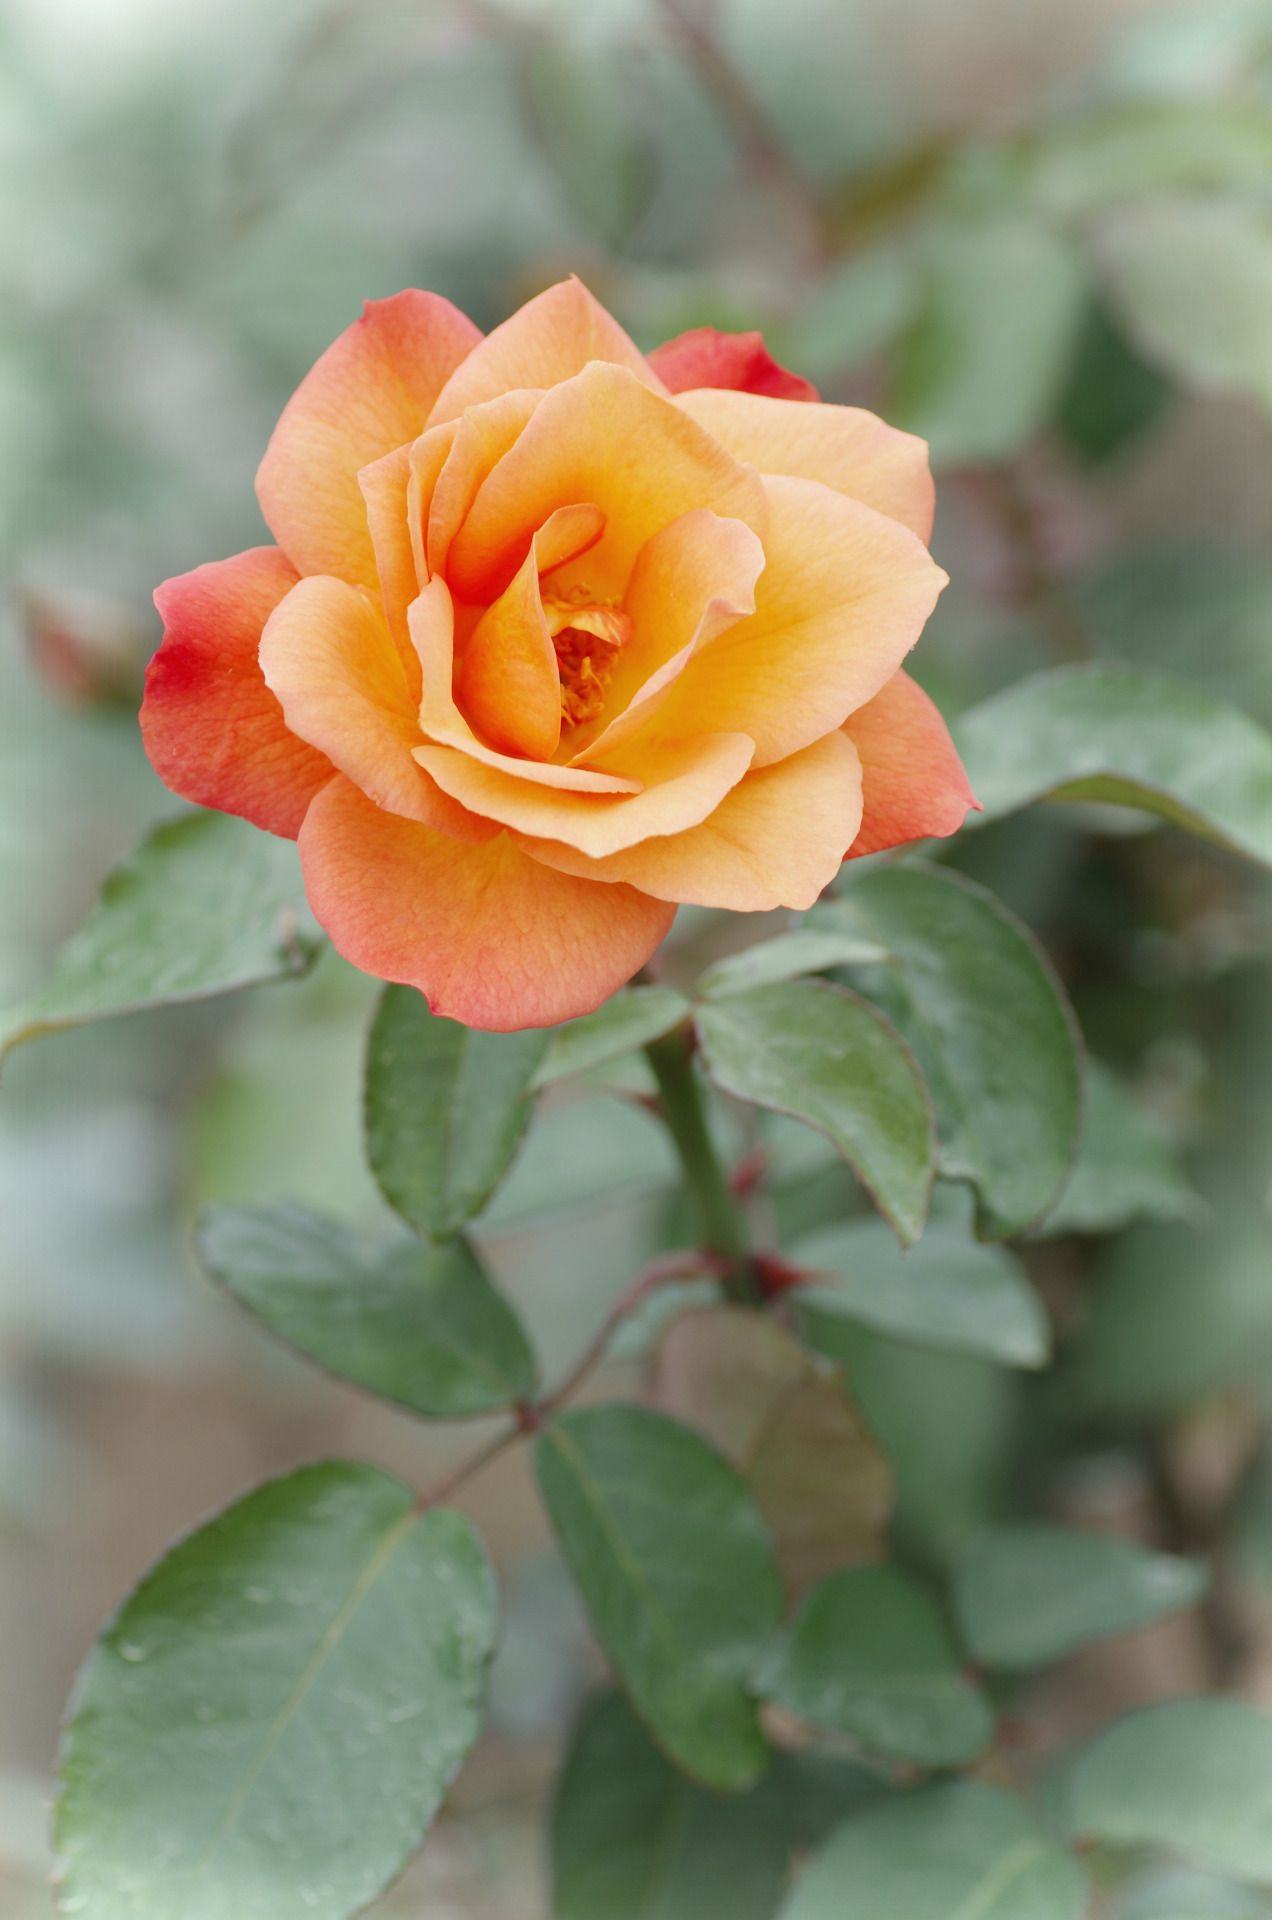 Flower Tumblr Art Pinterest Rose Flowers And Beautiful Flowers